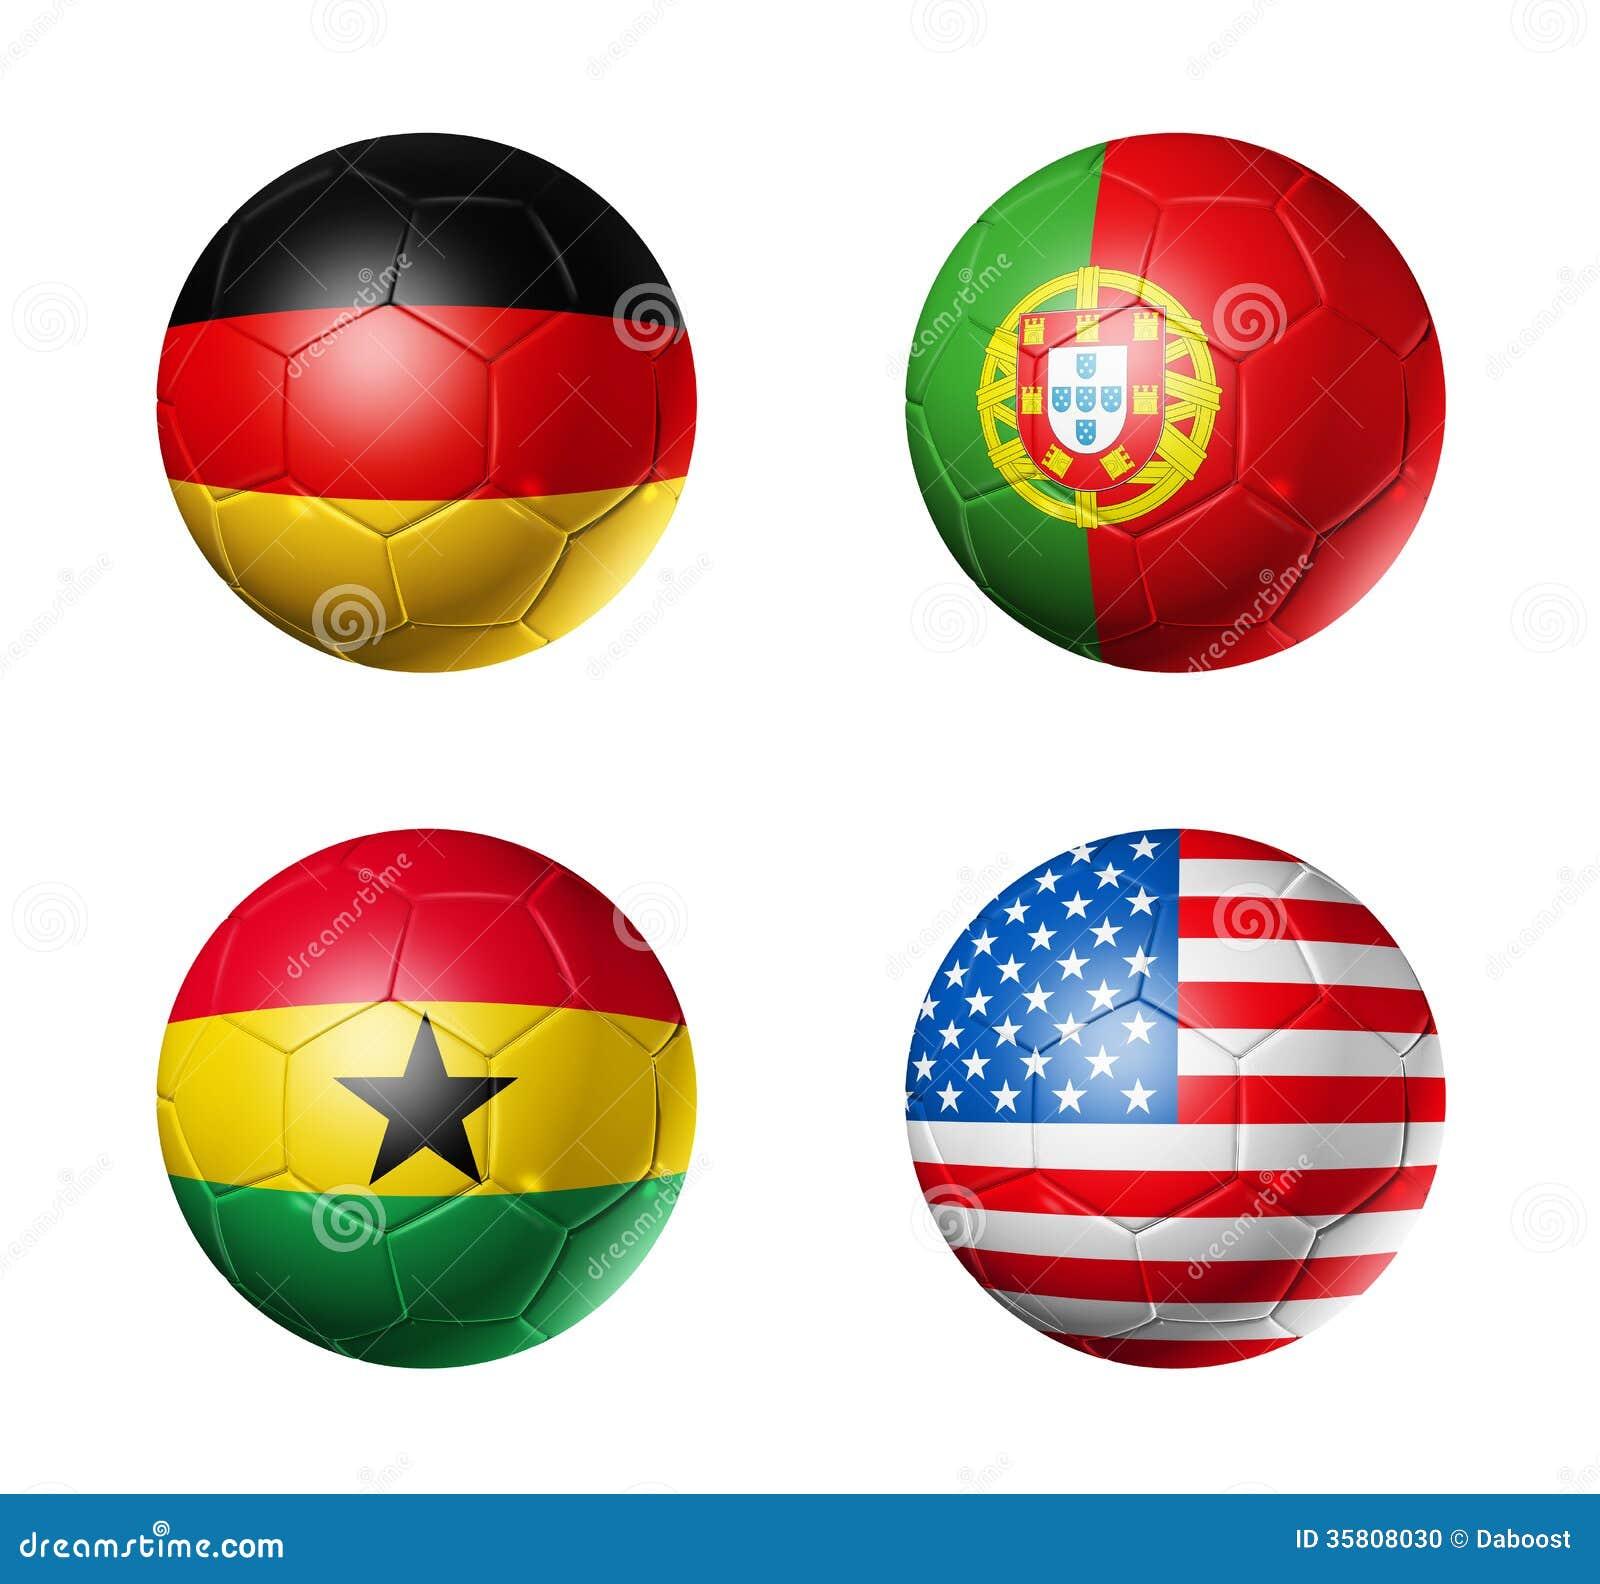 Brazil world cup 2014 group G flags on soccer ball